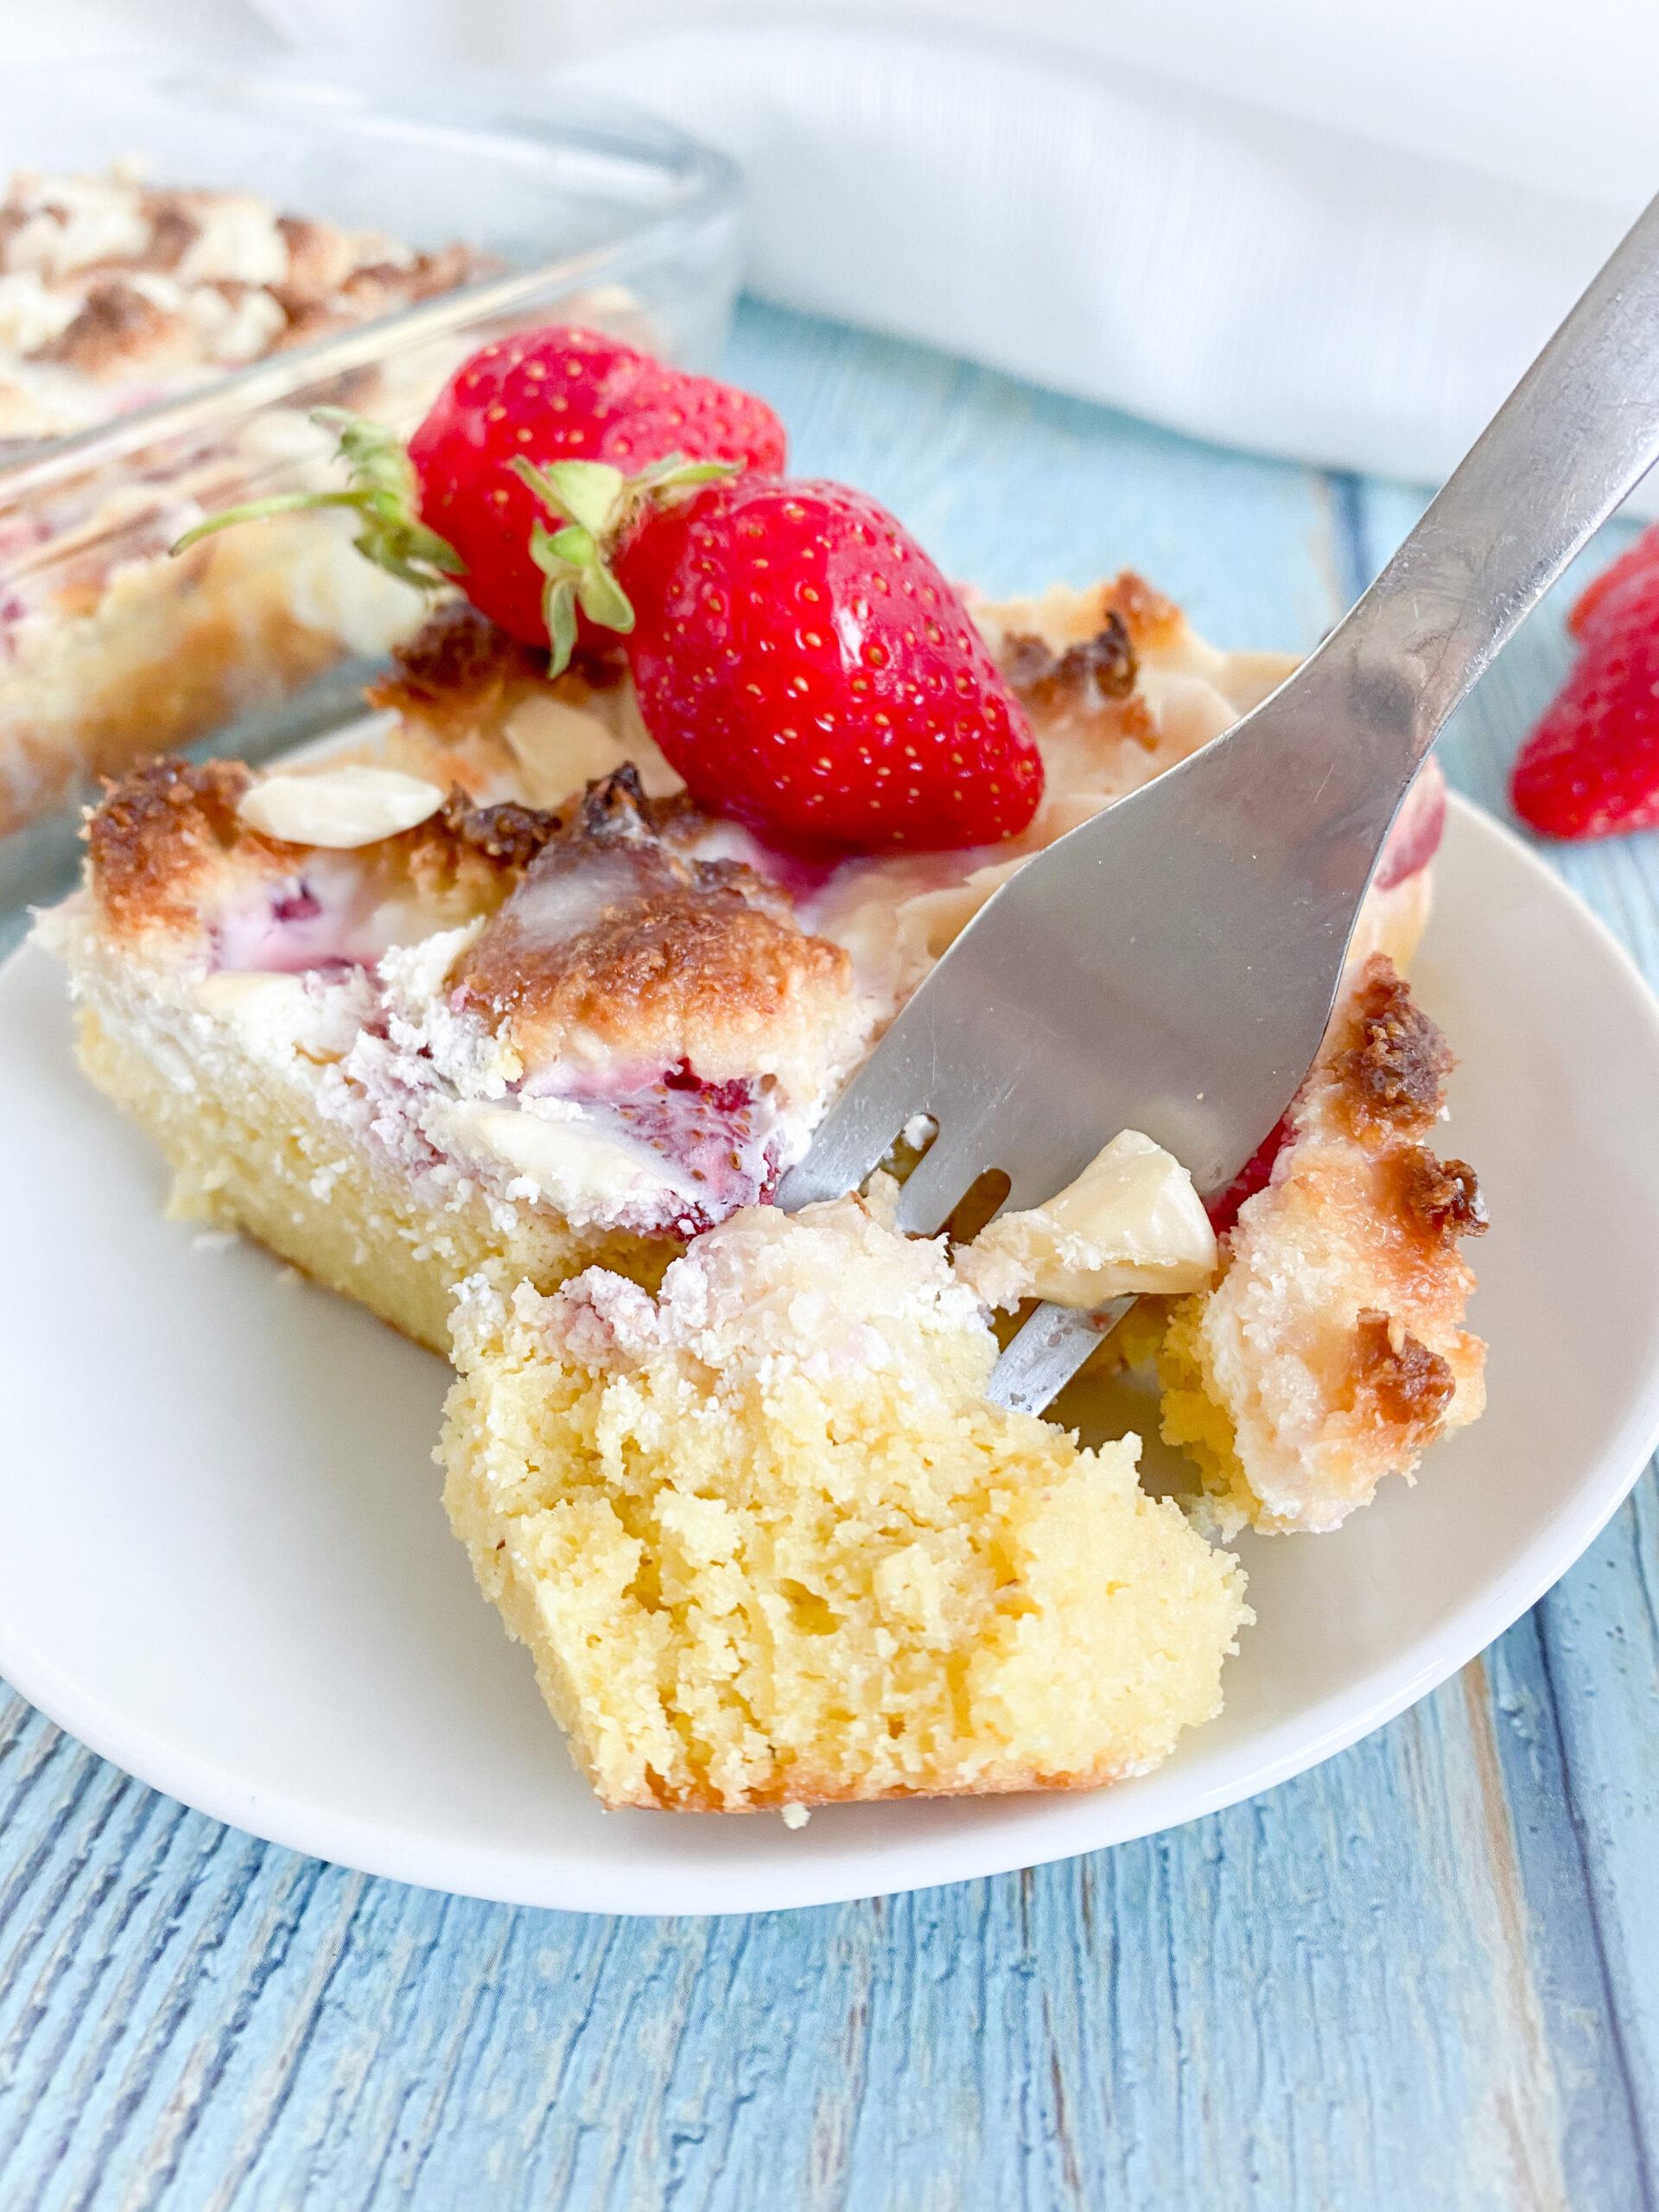 Picture of keto strawberry coffee cake slice